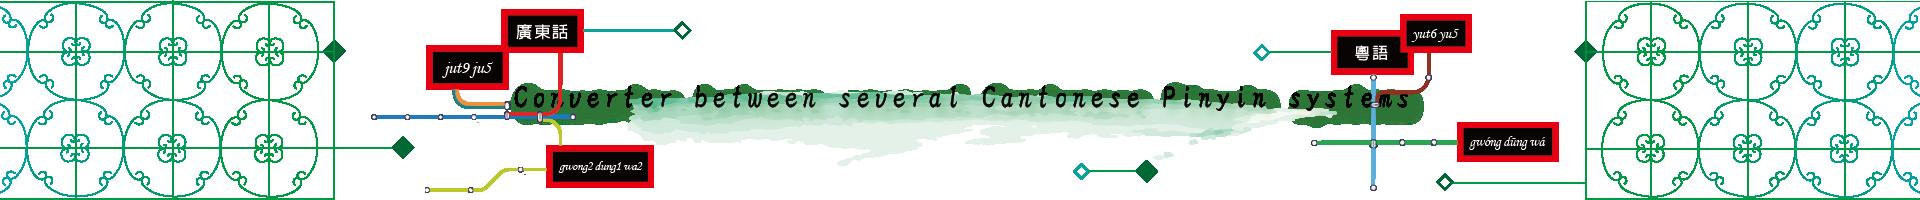 Converter between several Cantonese Pinyin systems